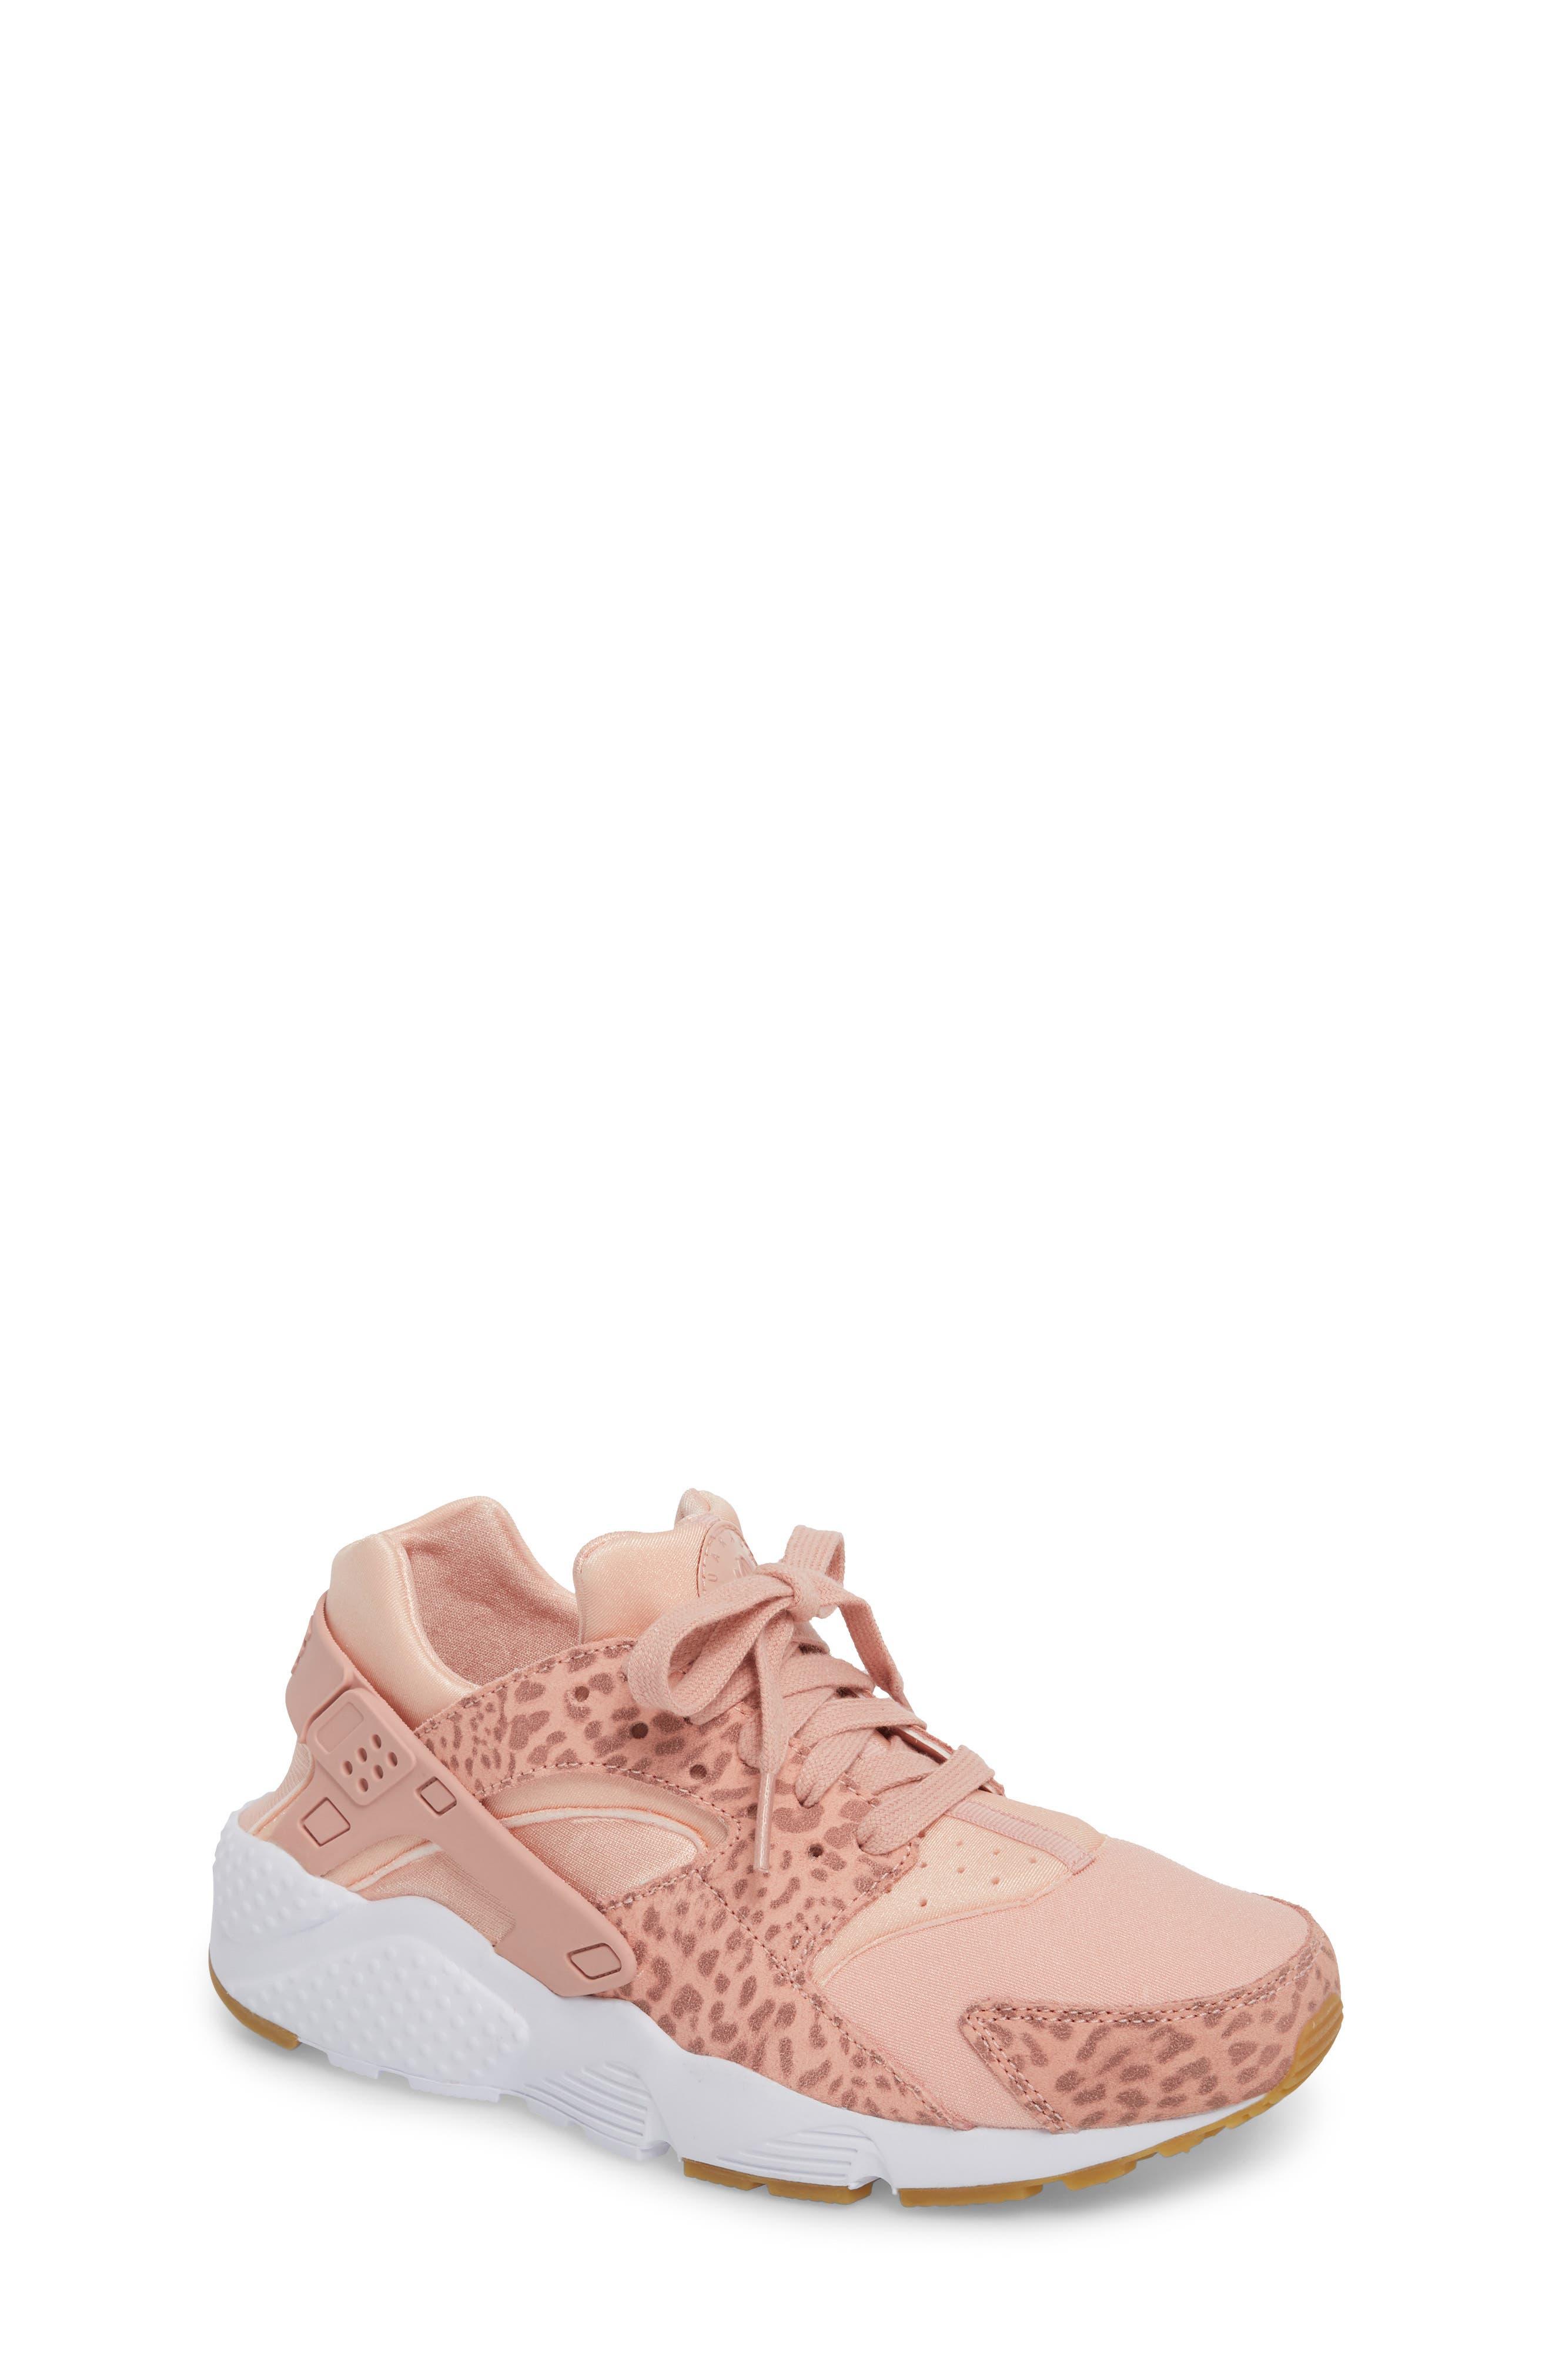 Huarache Run SE Sneaker,                         Main,                         color, Coral Stardust/ Rust Pink/ Gum